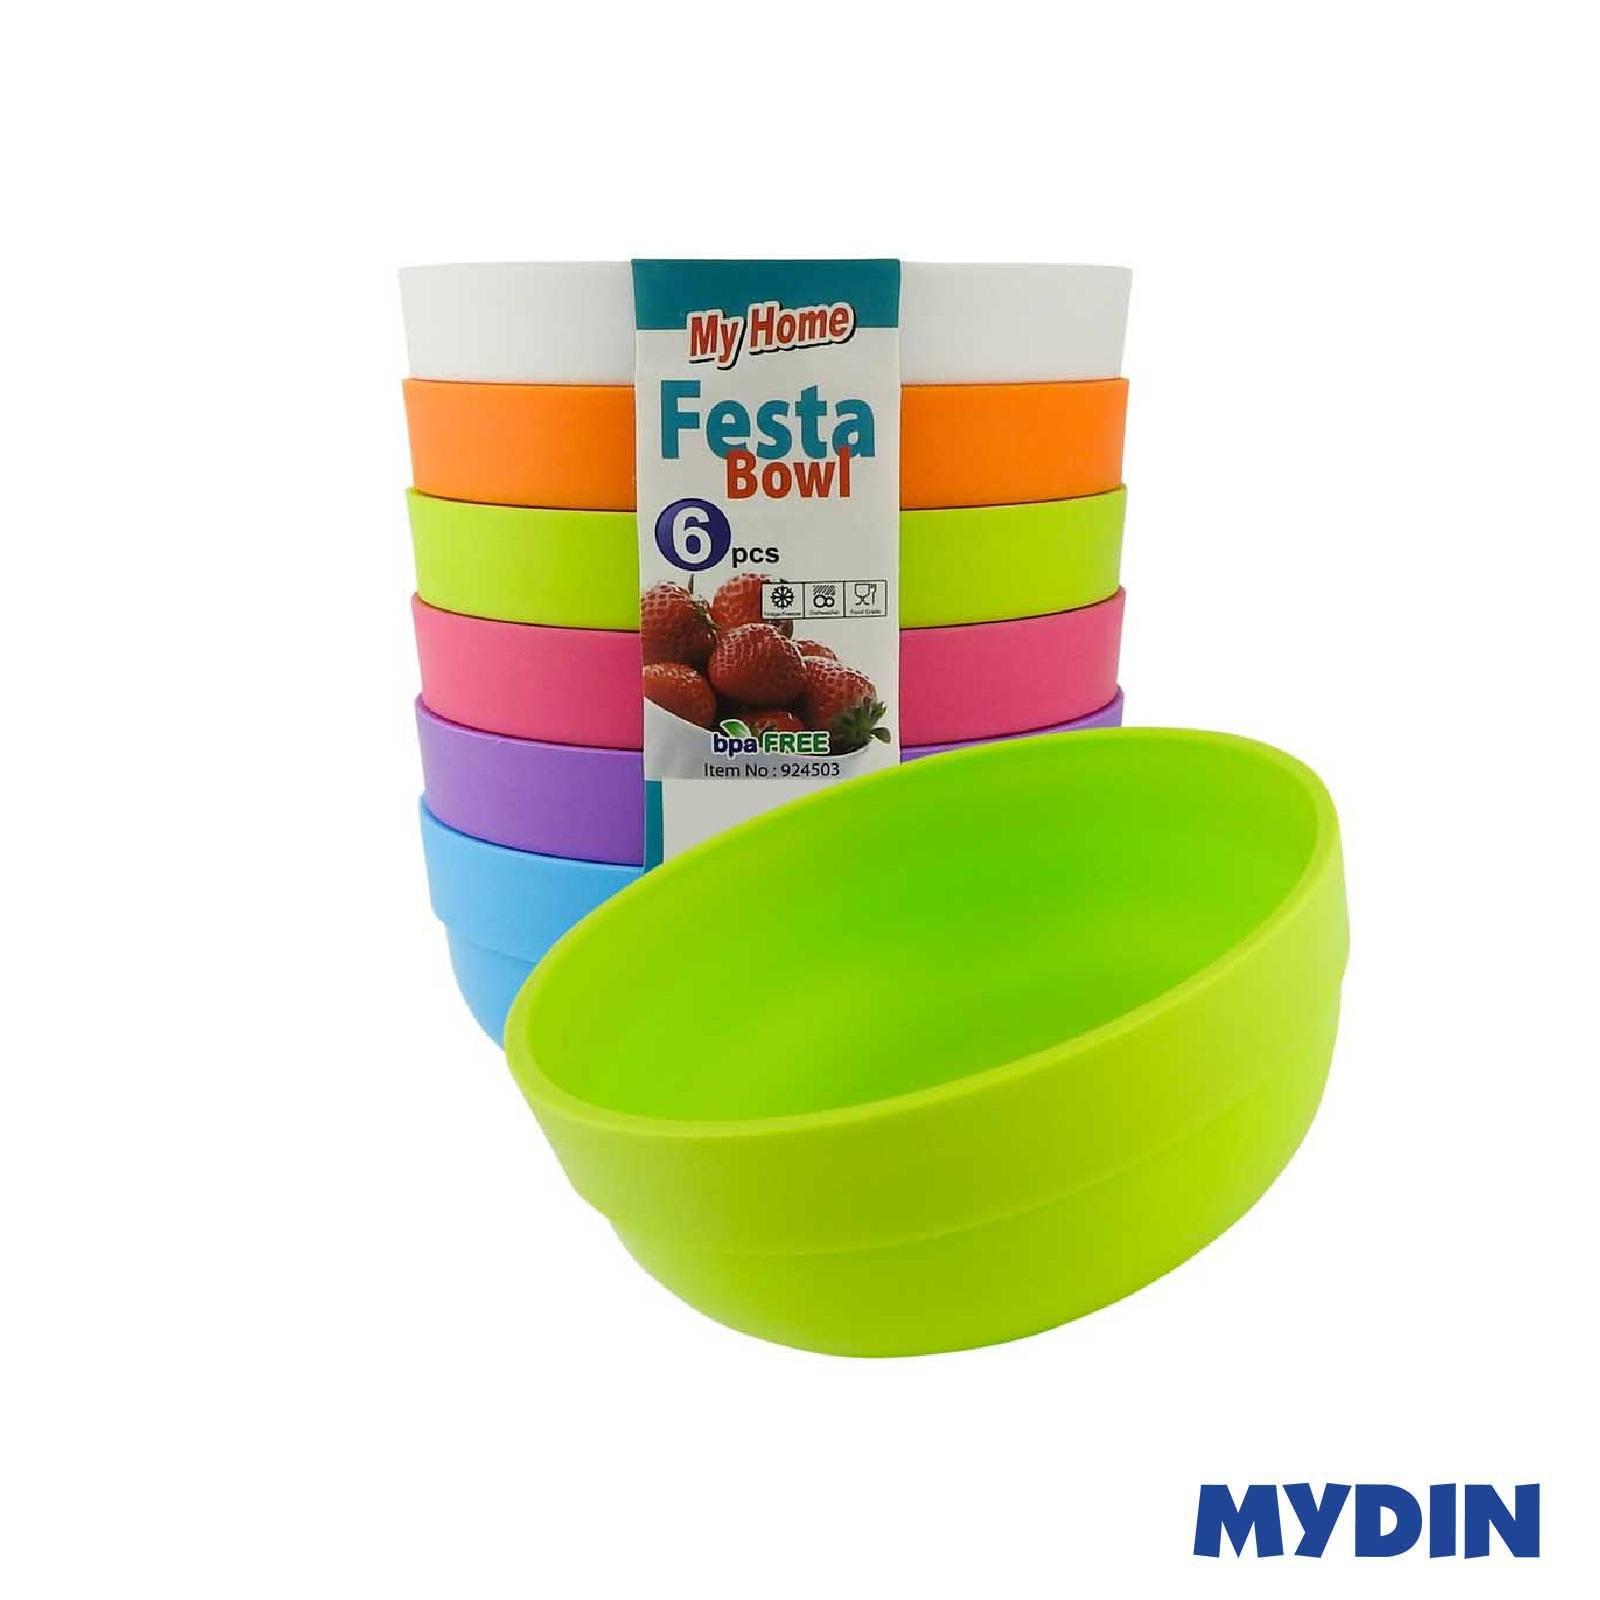 My Home Festa Bowl 6s 924503